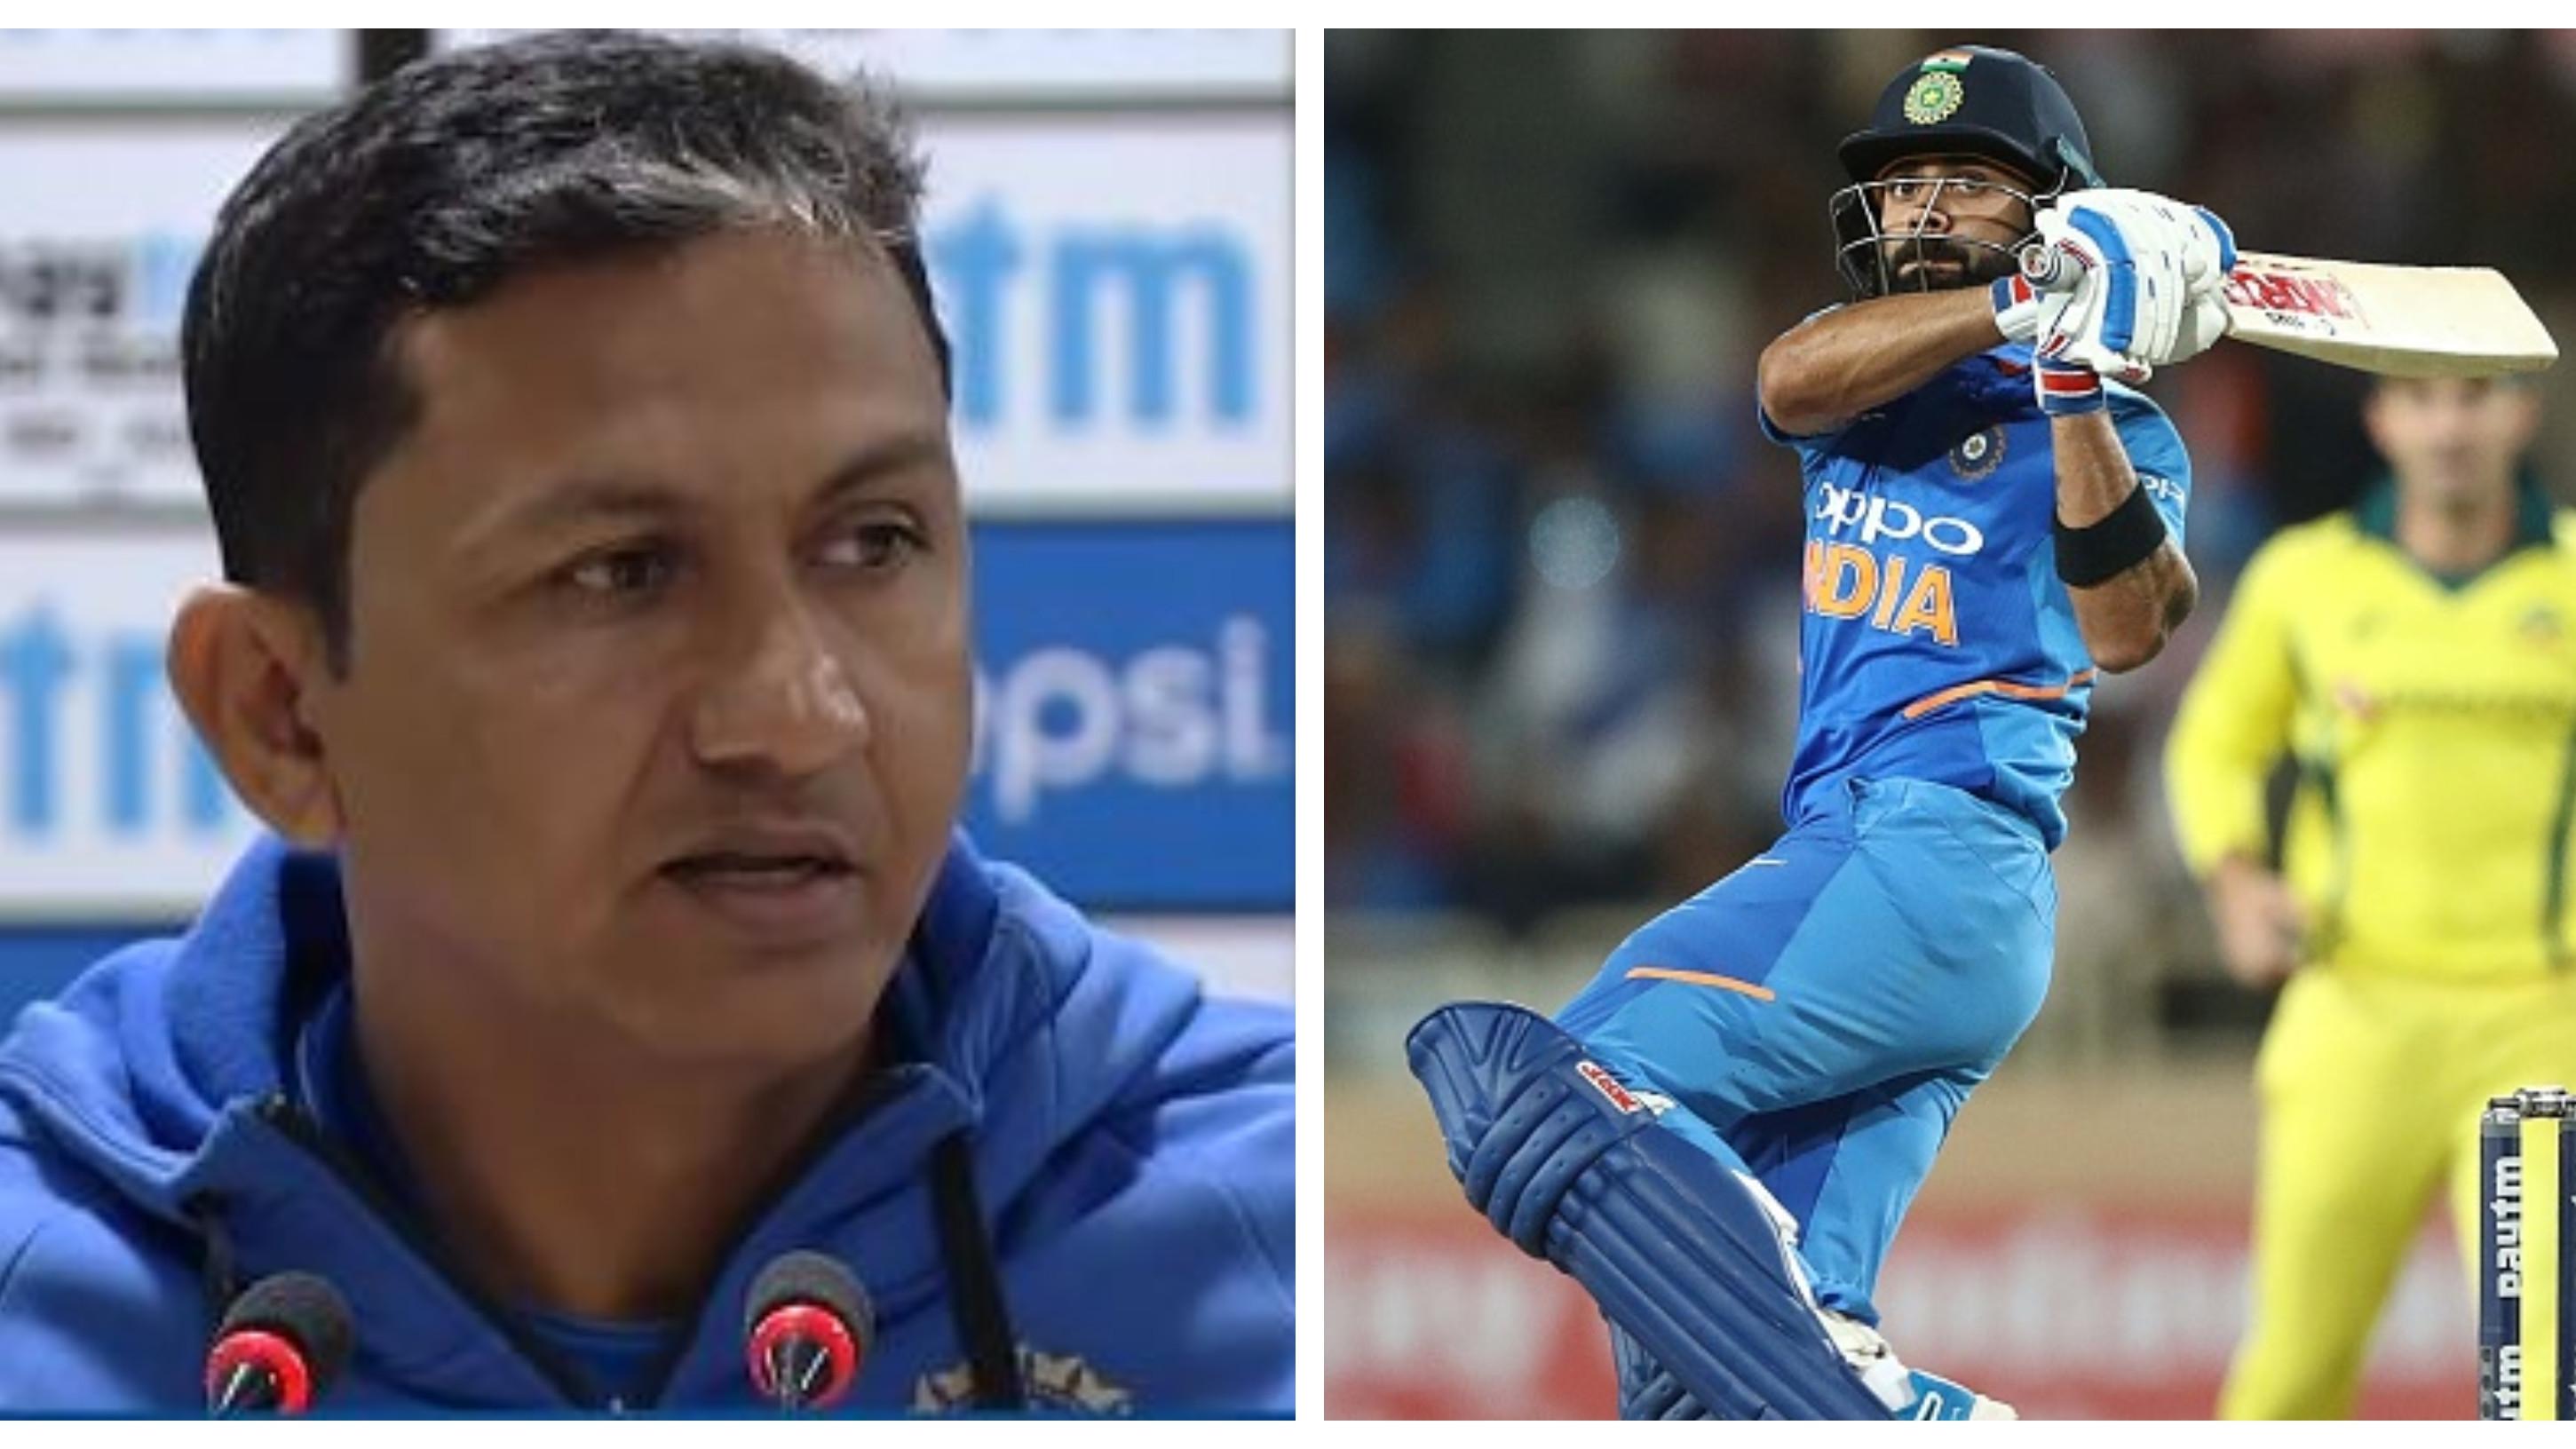 IND v AUS 2019: Sanjay Bangar praises Virat Kohli's quest for excellence